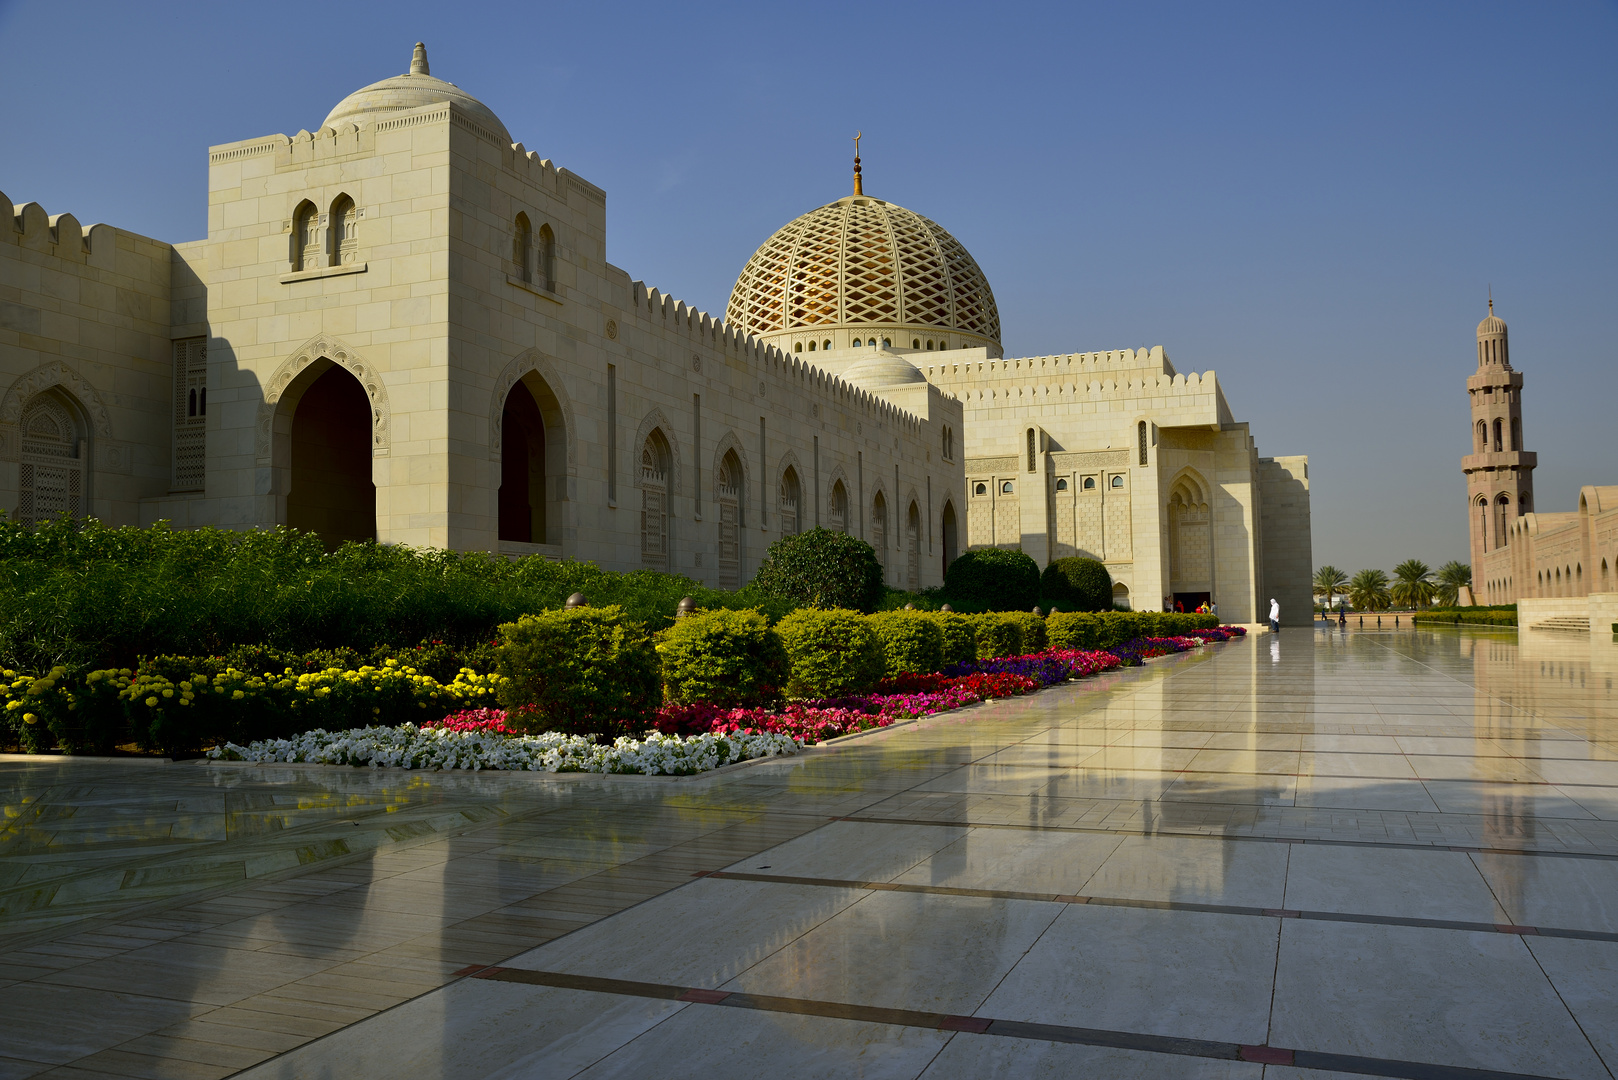 Sultan Qaboos Moschee / Maskat